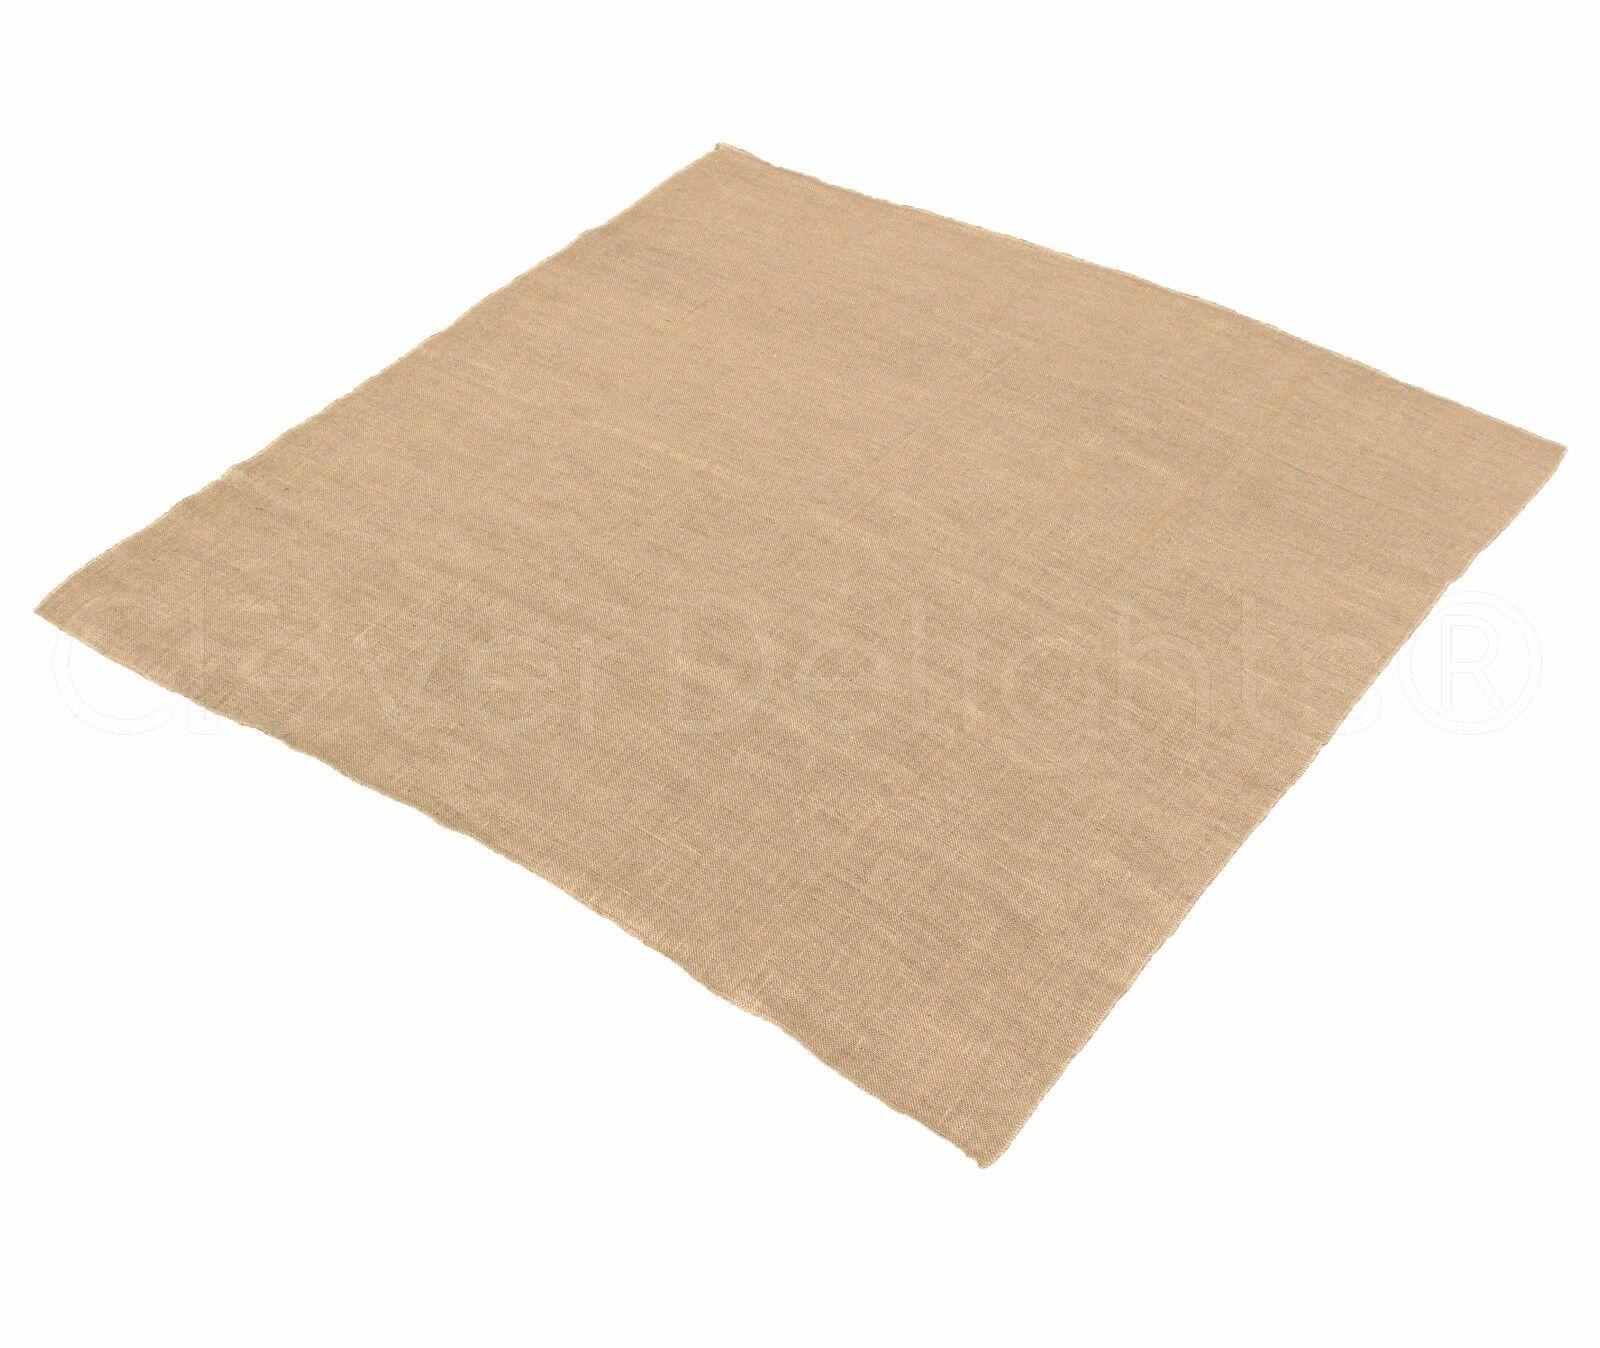 10 Pk - 60  Square Burlap Tablecloth Overlay - Natural Burlap - Finished Edges